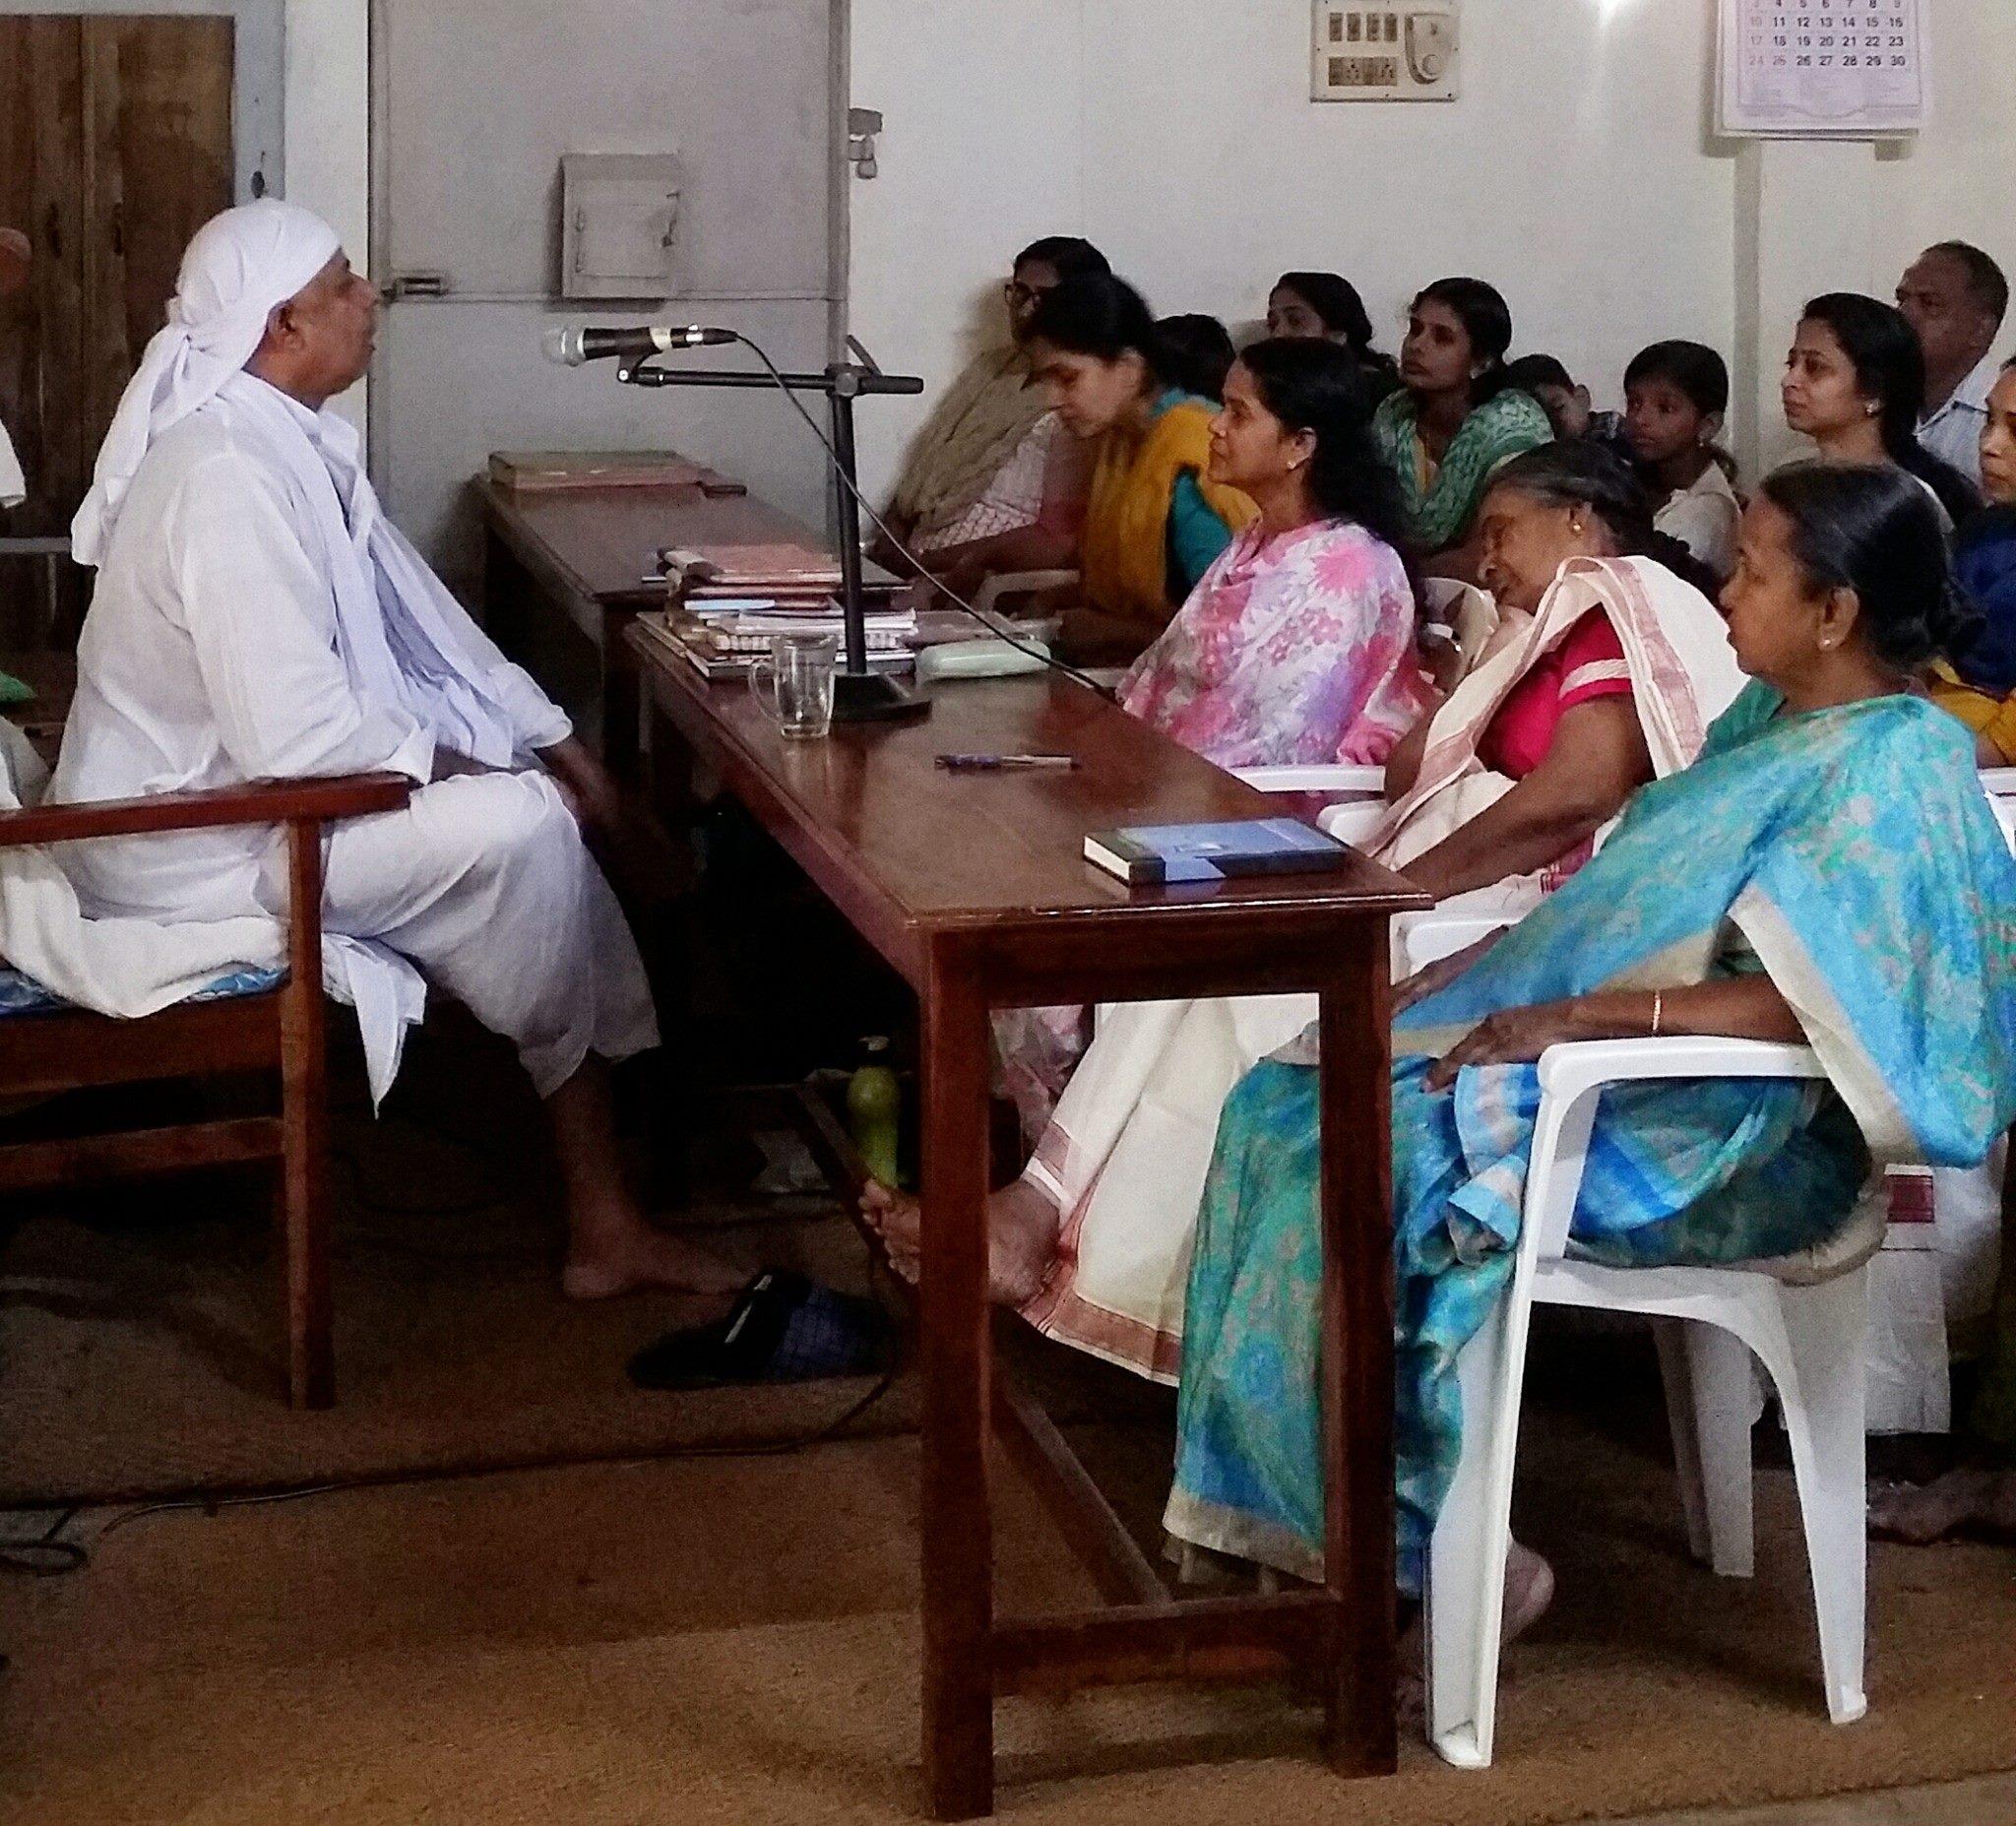 calatorie ashram, training india, yoga, spiritualitate